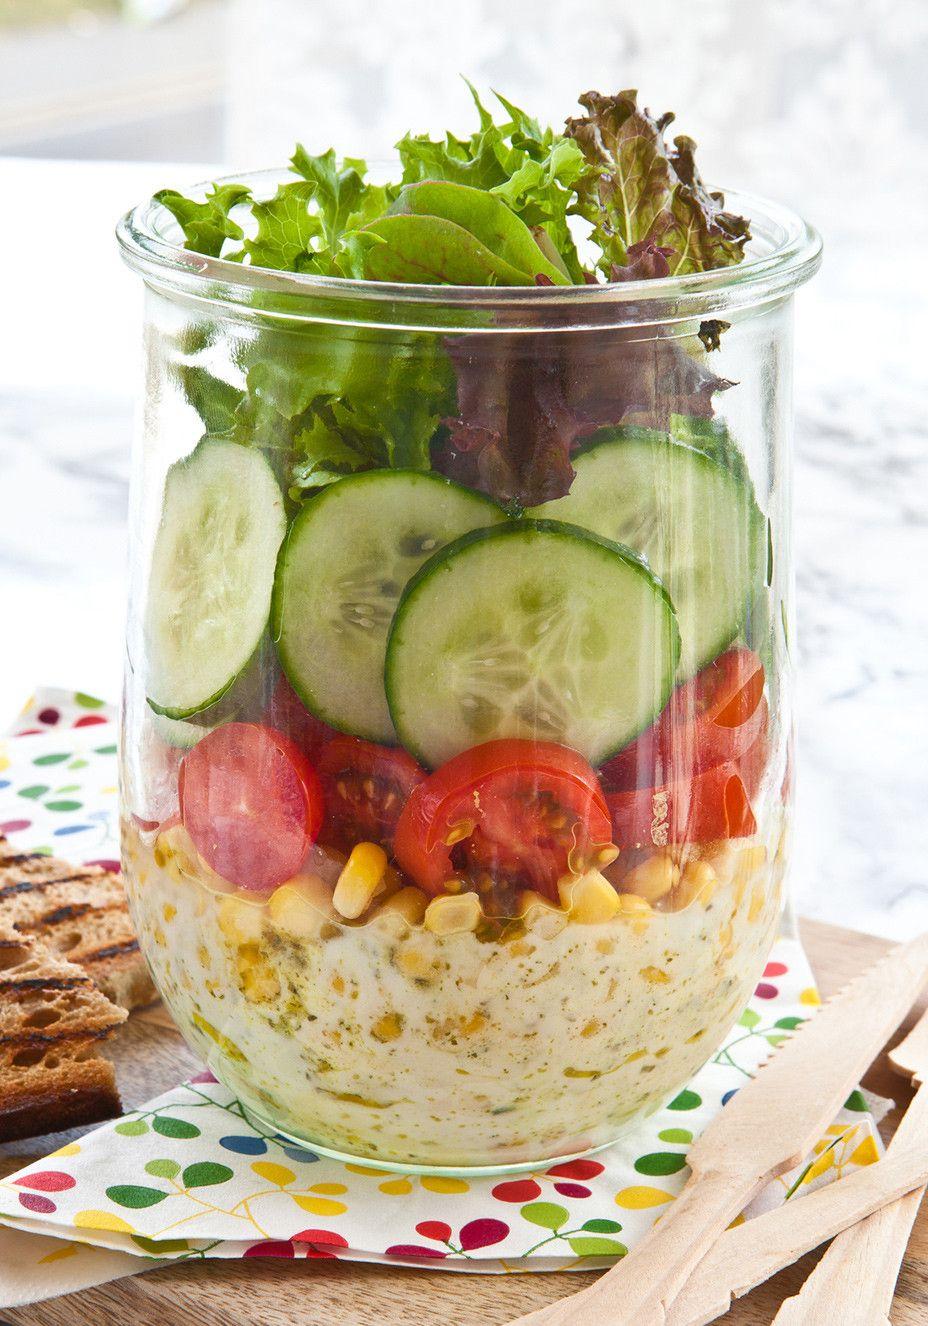 Potes para organizar dieta